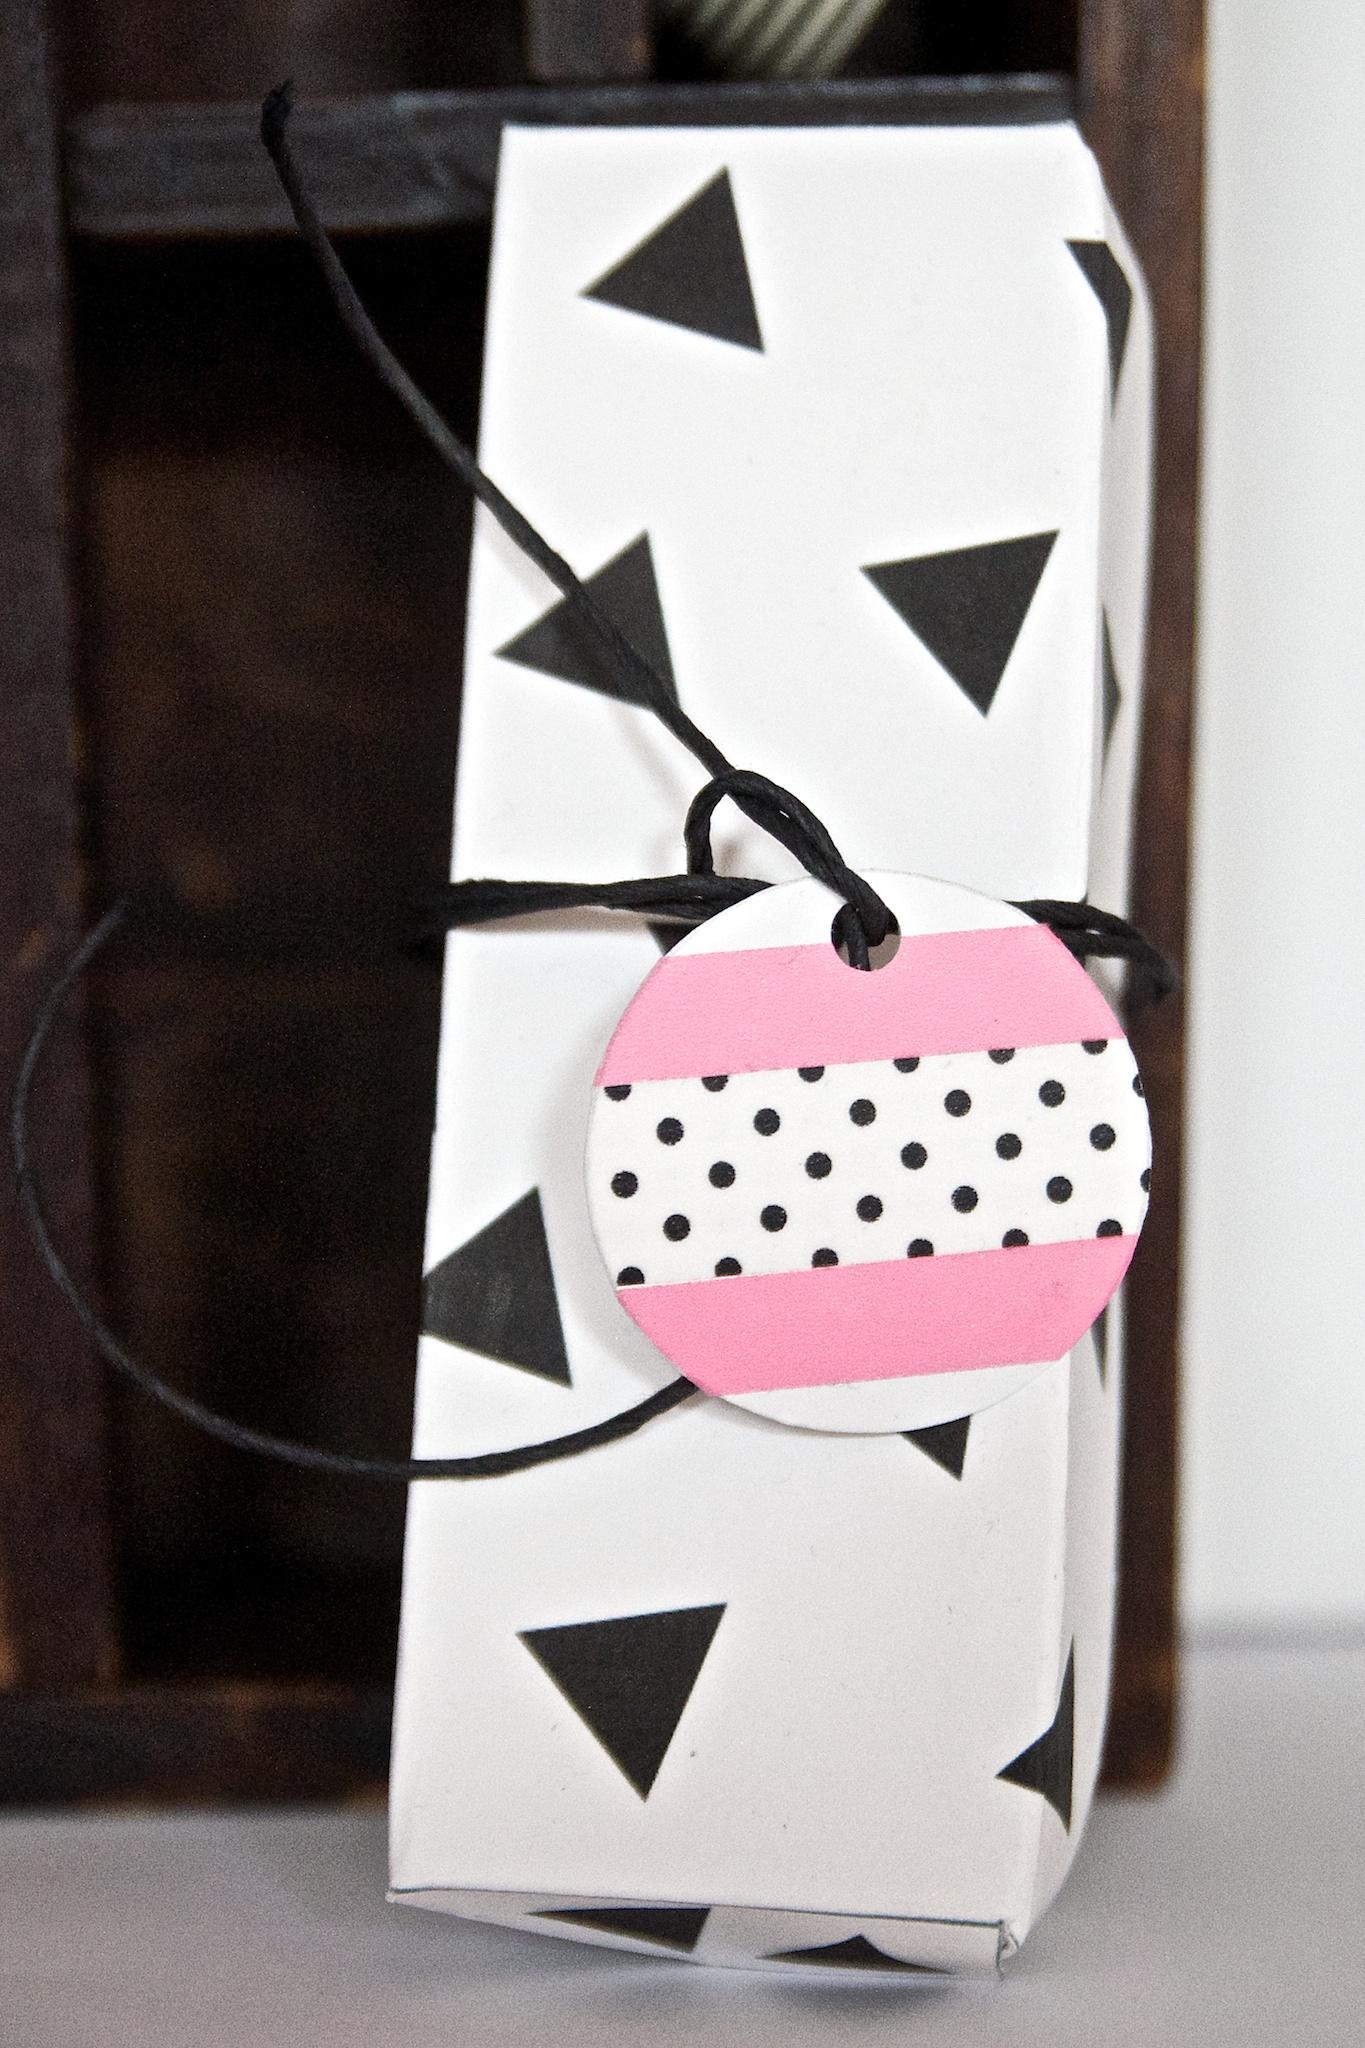 Free Printable Box Triangles Polka Dots Black White Pink Neon DIY Pinkepank Blog